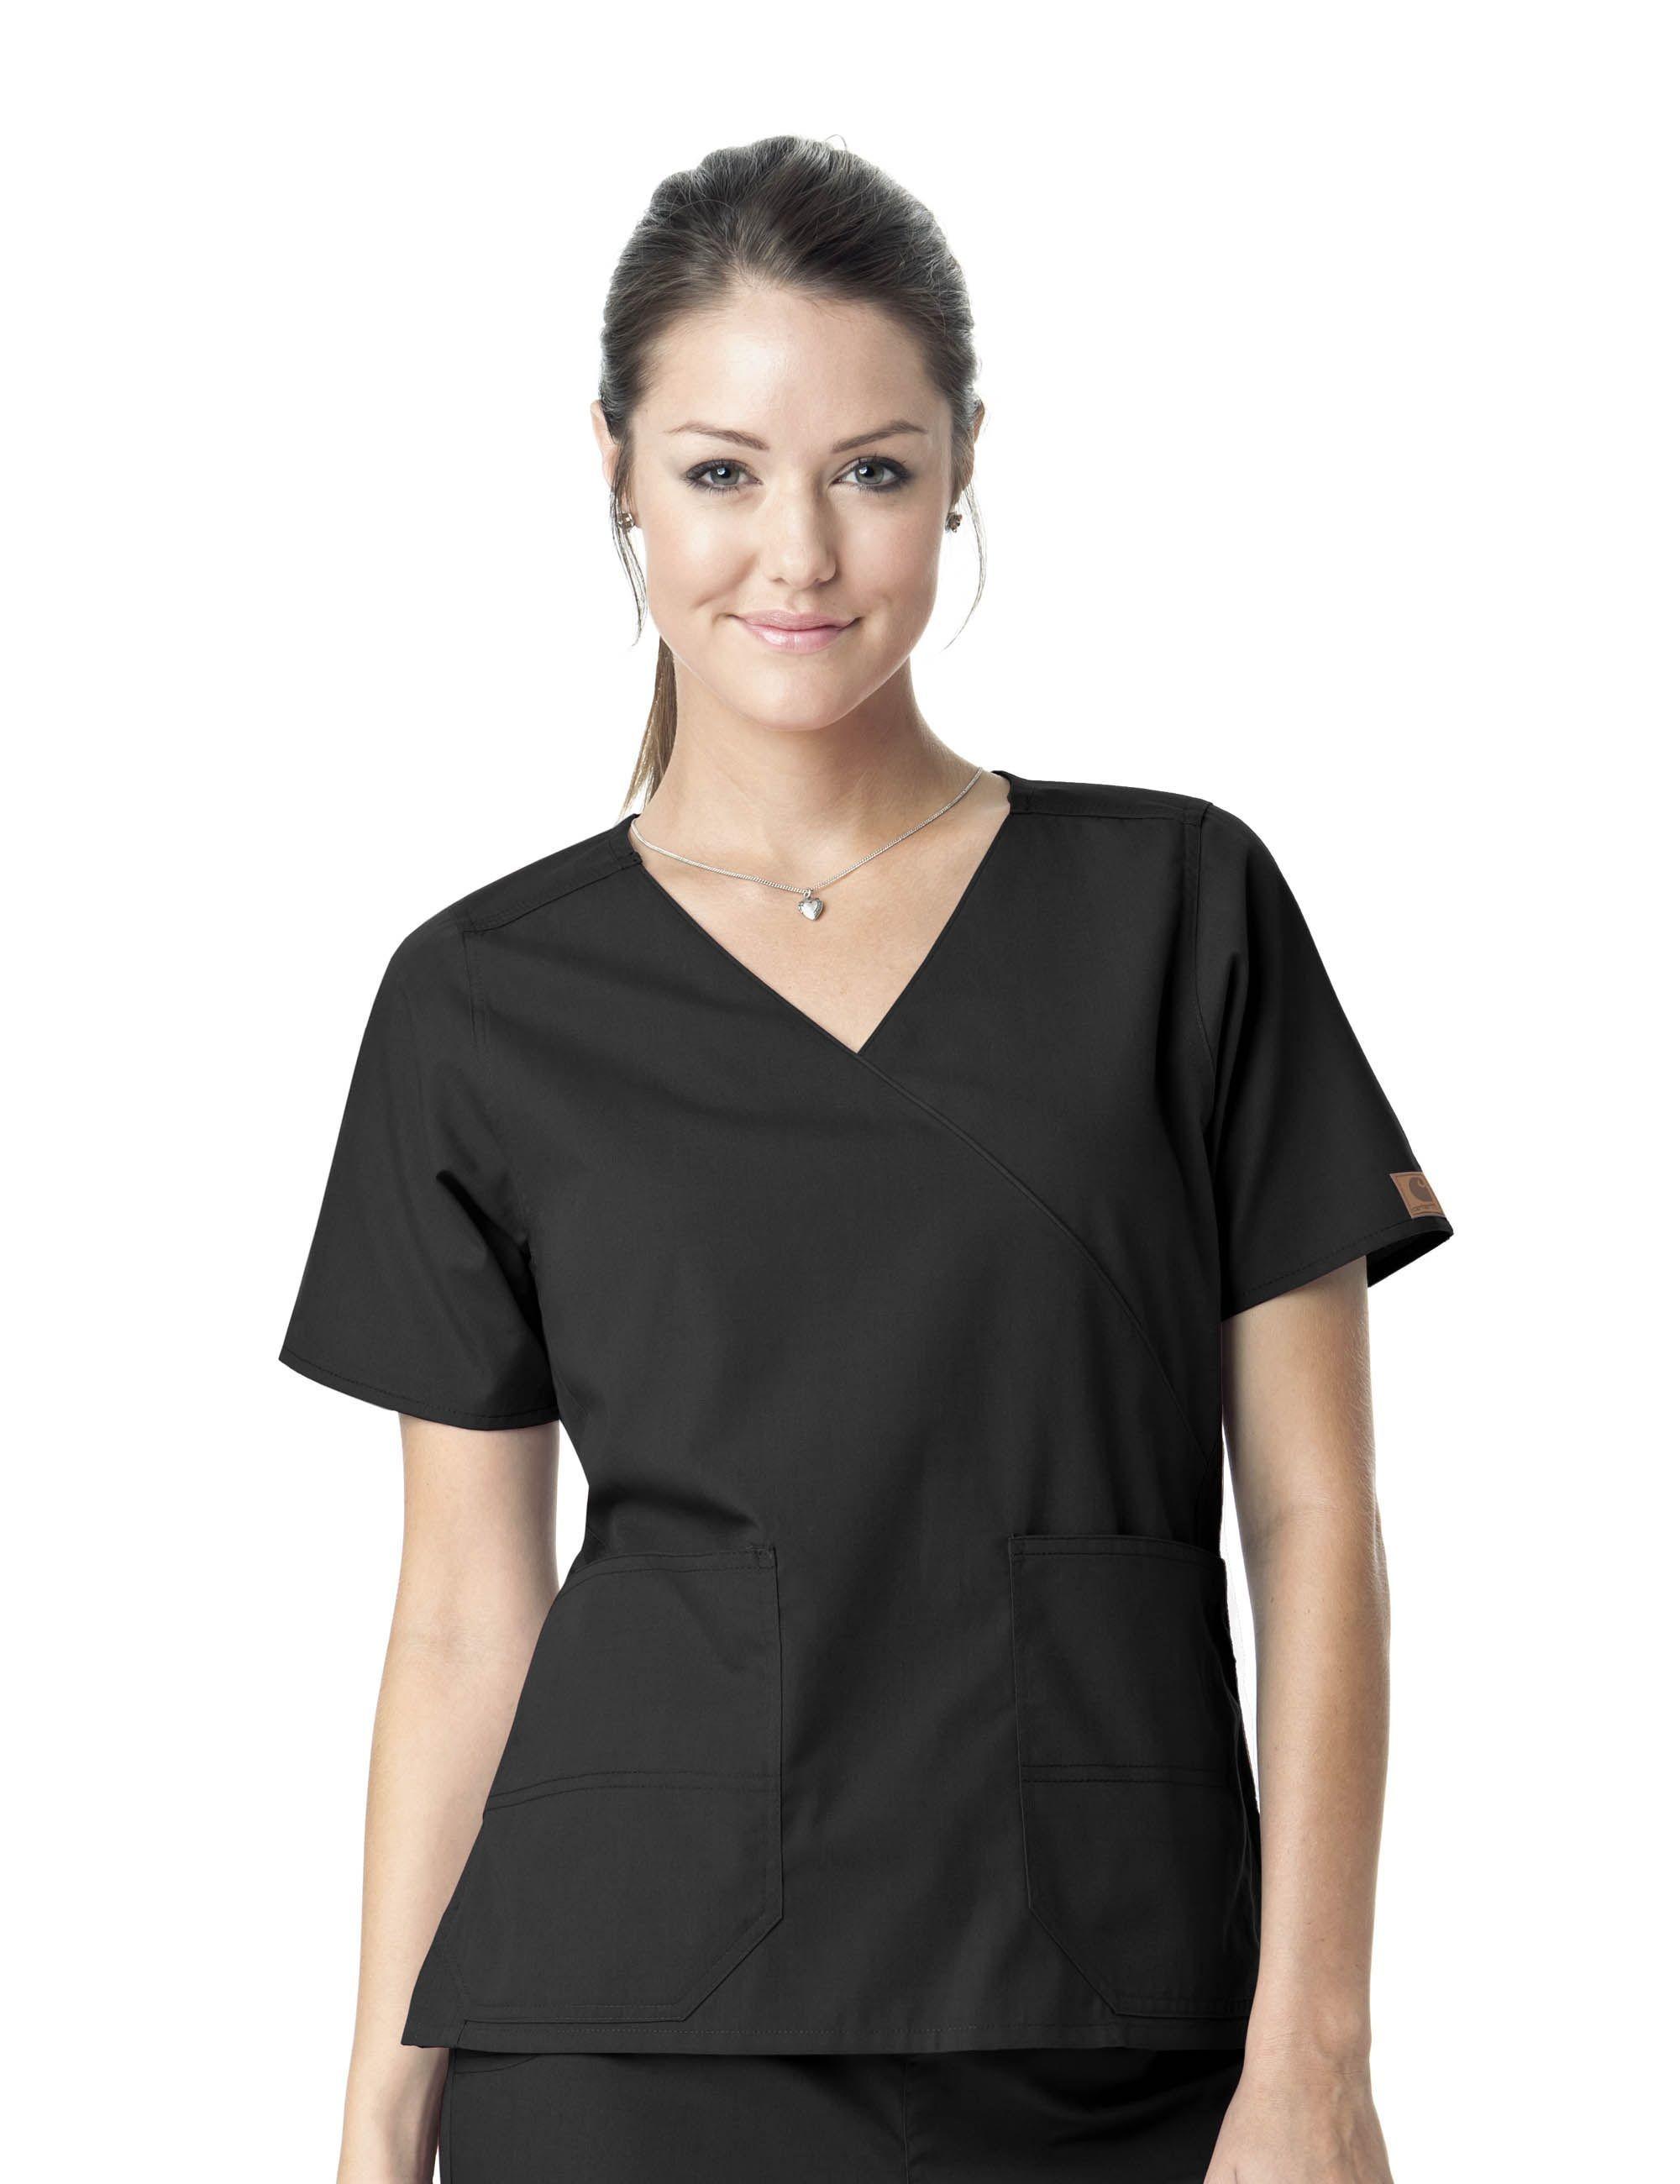 13545bf2058 Two Pocket Premium Mock Wrap Scrub Top by Carhartt. Black #scrubs #uniforms